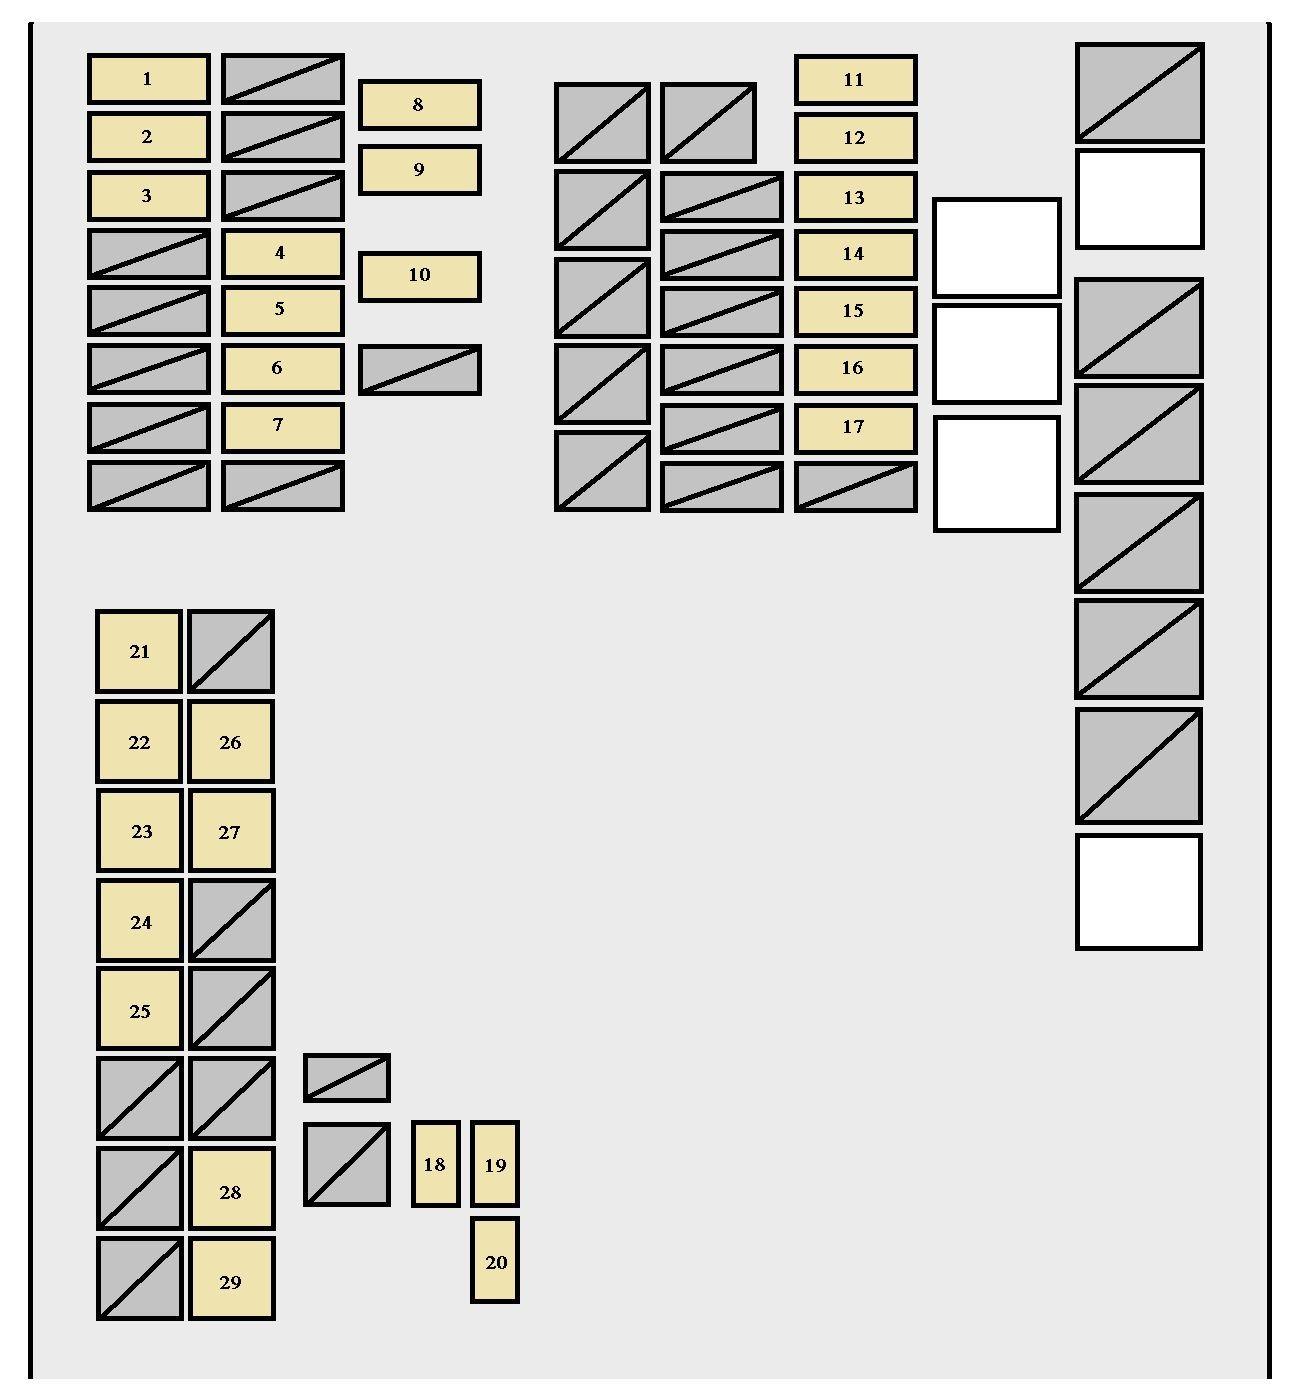 hight resolution of 08 scion xb fuse box wiring diagrams u2022 2012 scion tc fuse box 2008 scion xb fuse box